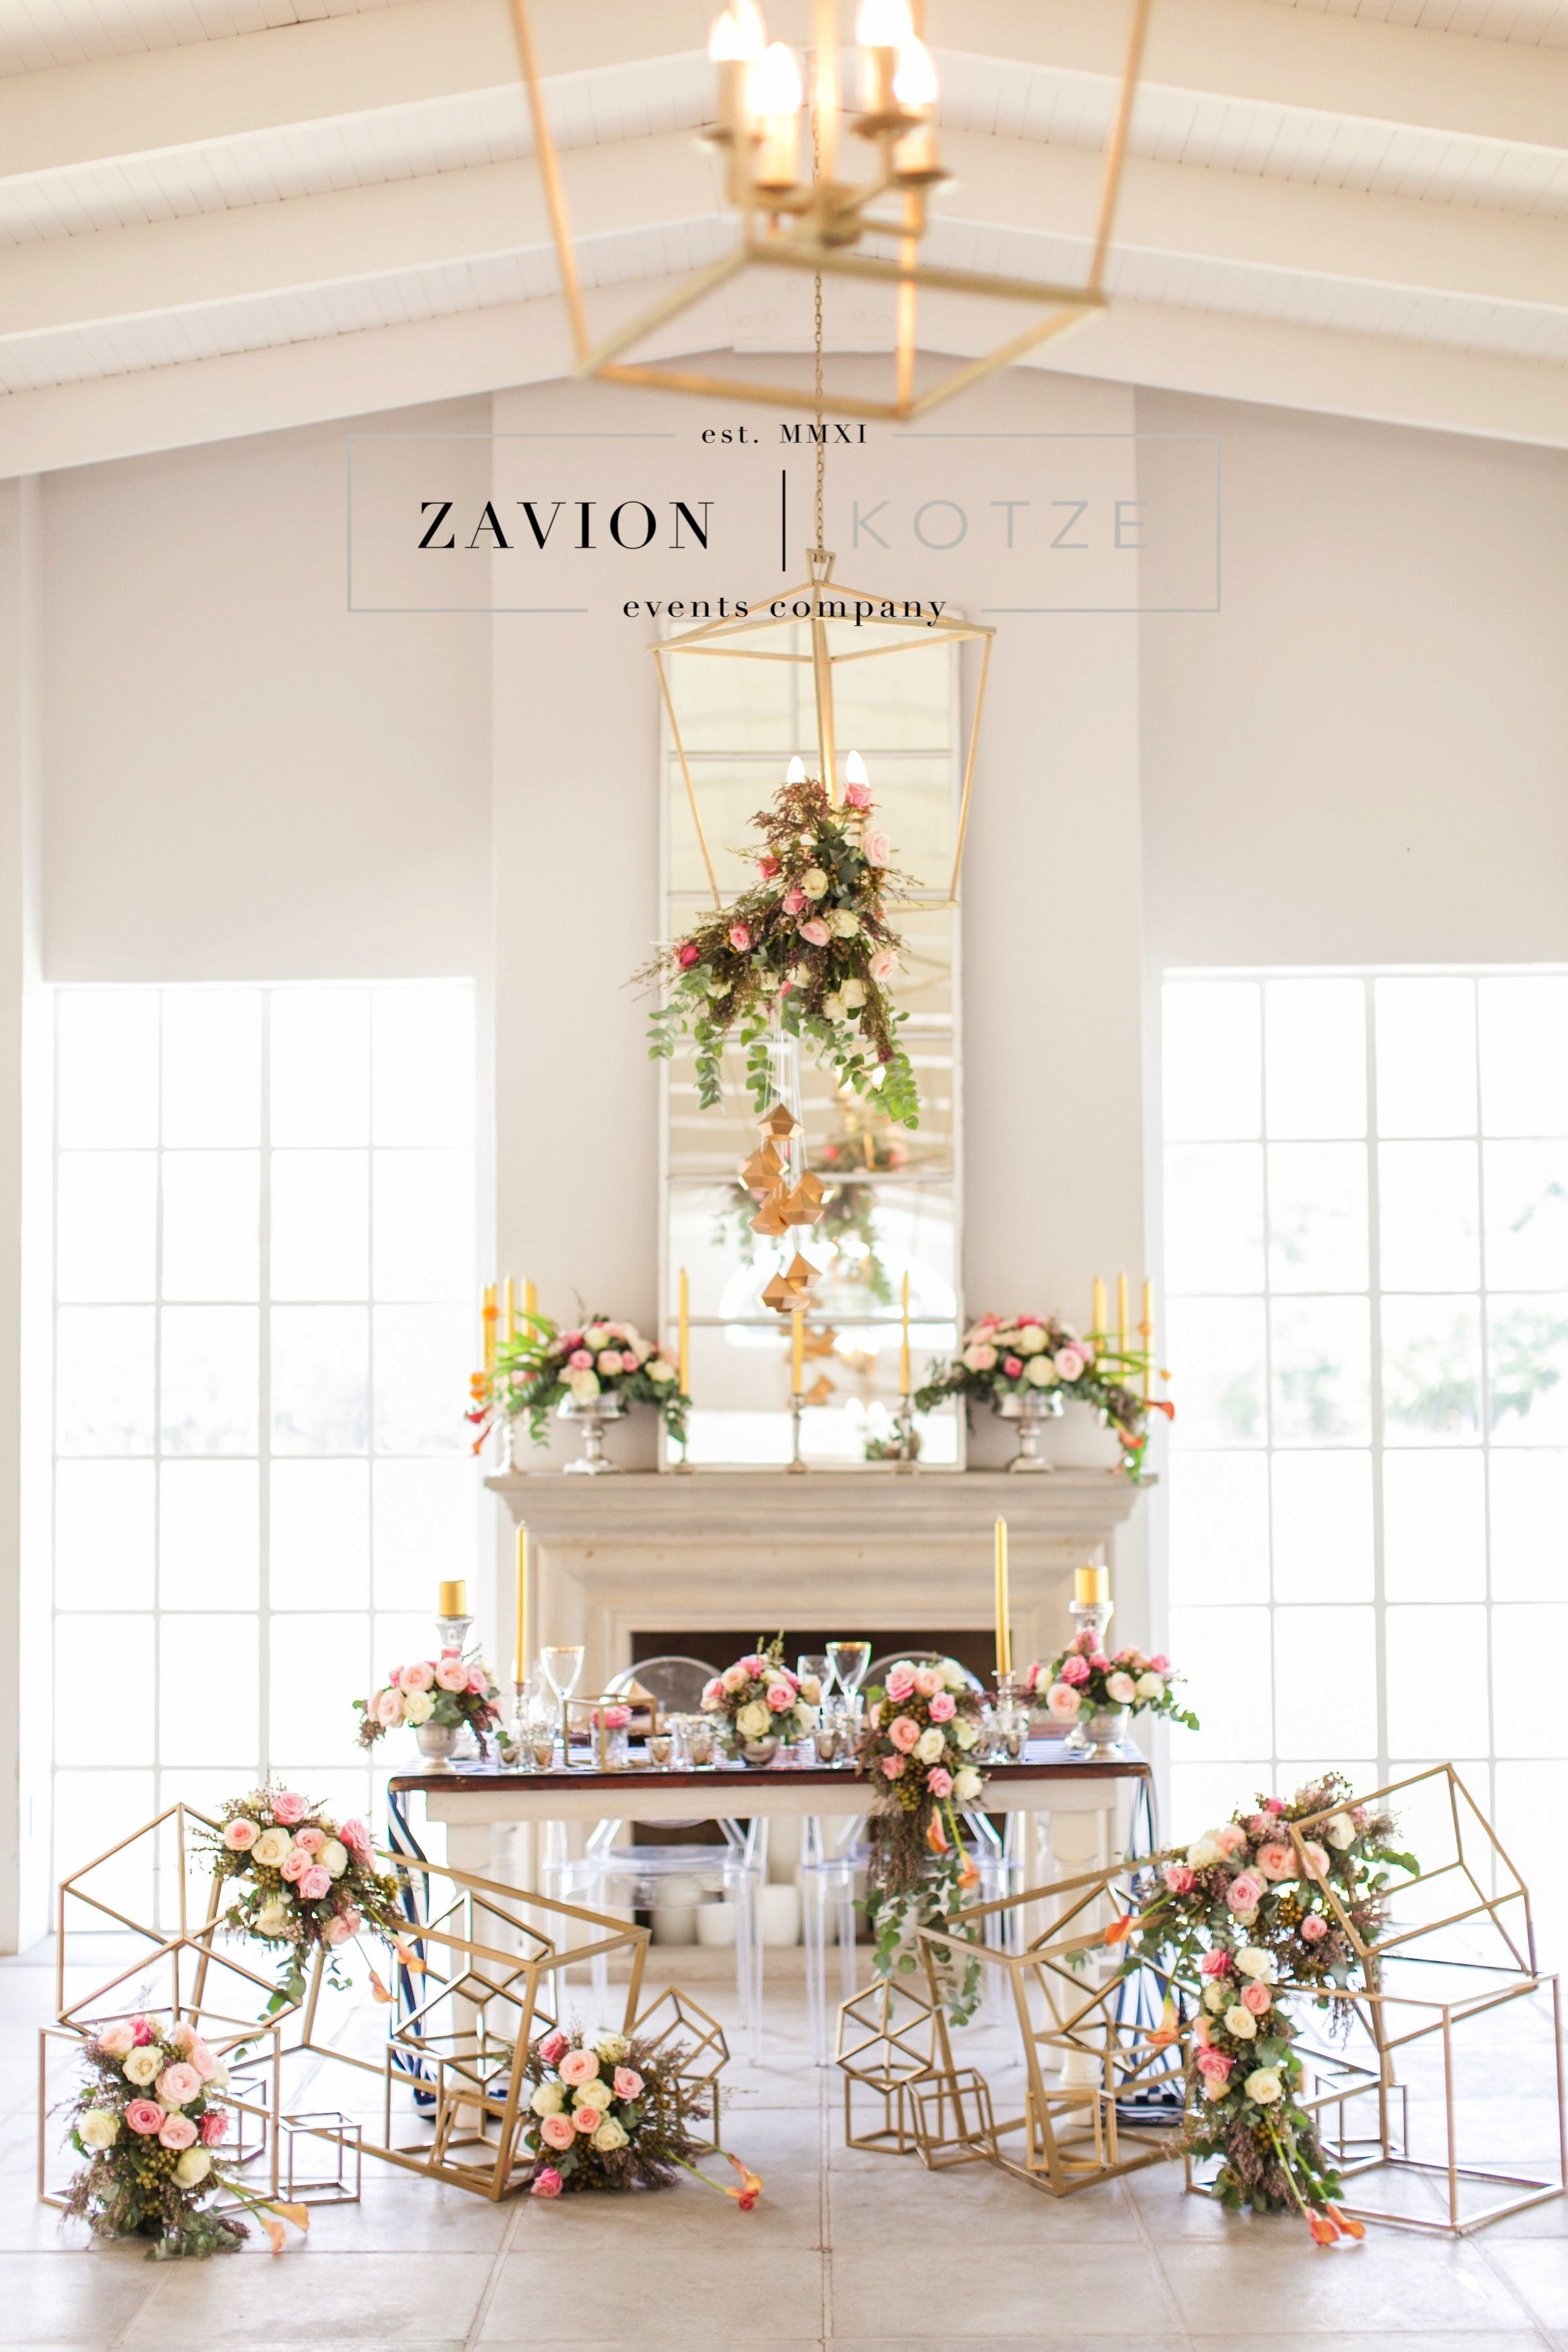 7fd19da55 Stunning wedding table, black, white, geometric, gold, roses, tulips, wood  tables, silver, navy blue, asymmetric flowers, wedding flowers and decor  décor, ...